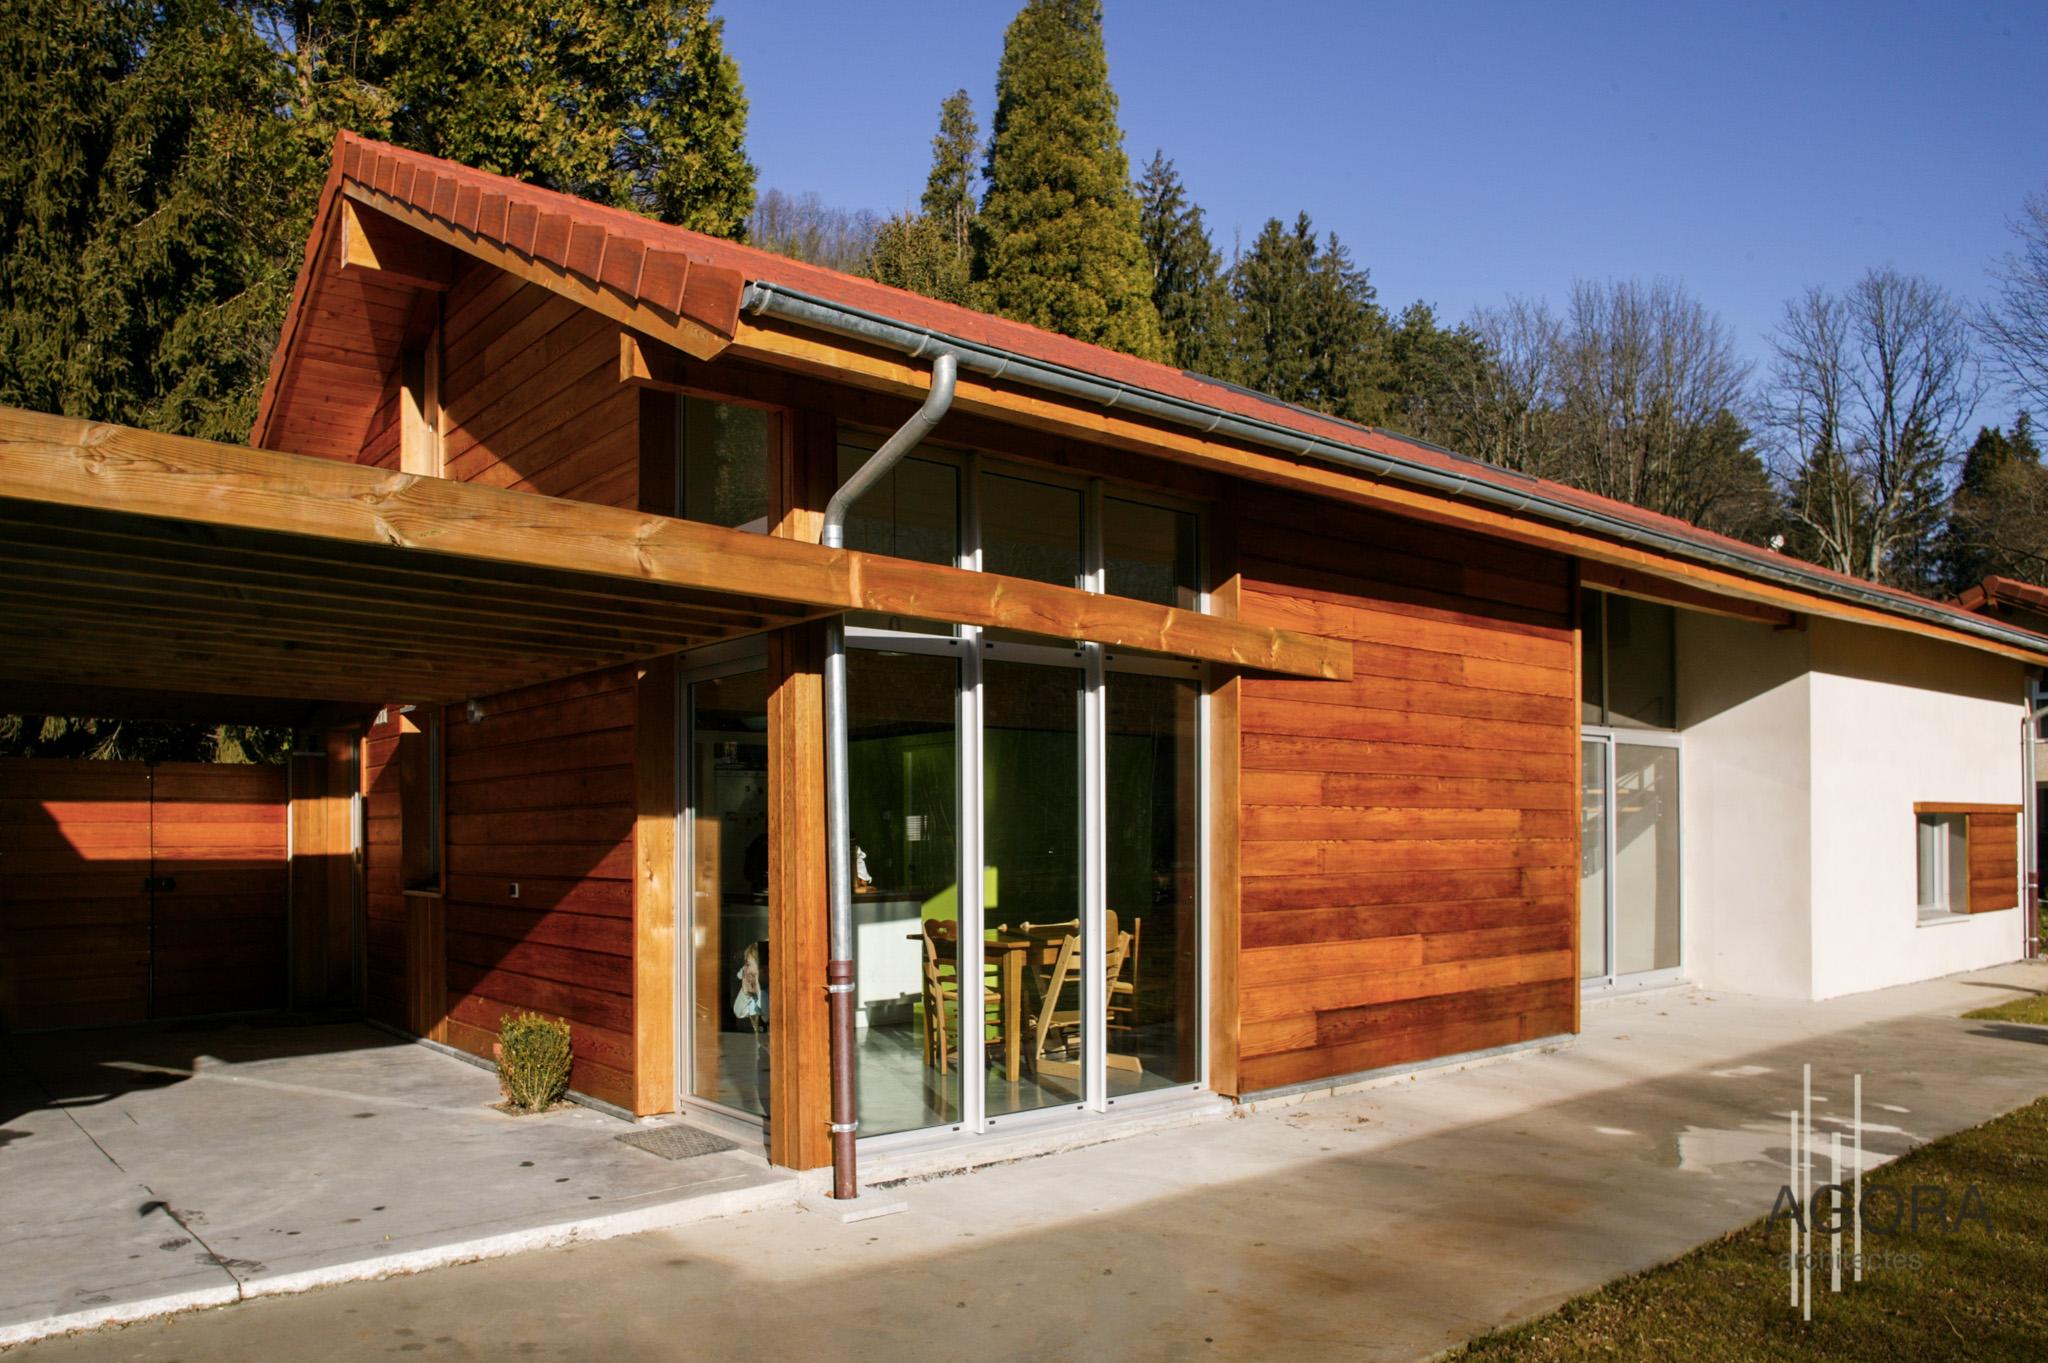 Villa p uriage 38 agora architectes grenoble agora for Architecte grenoble